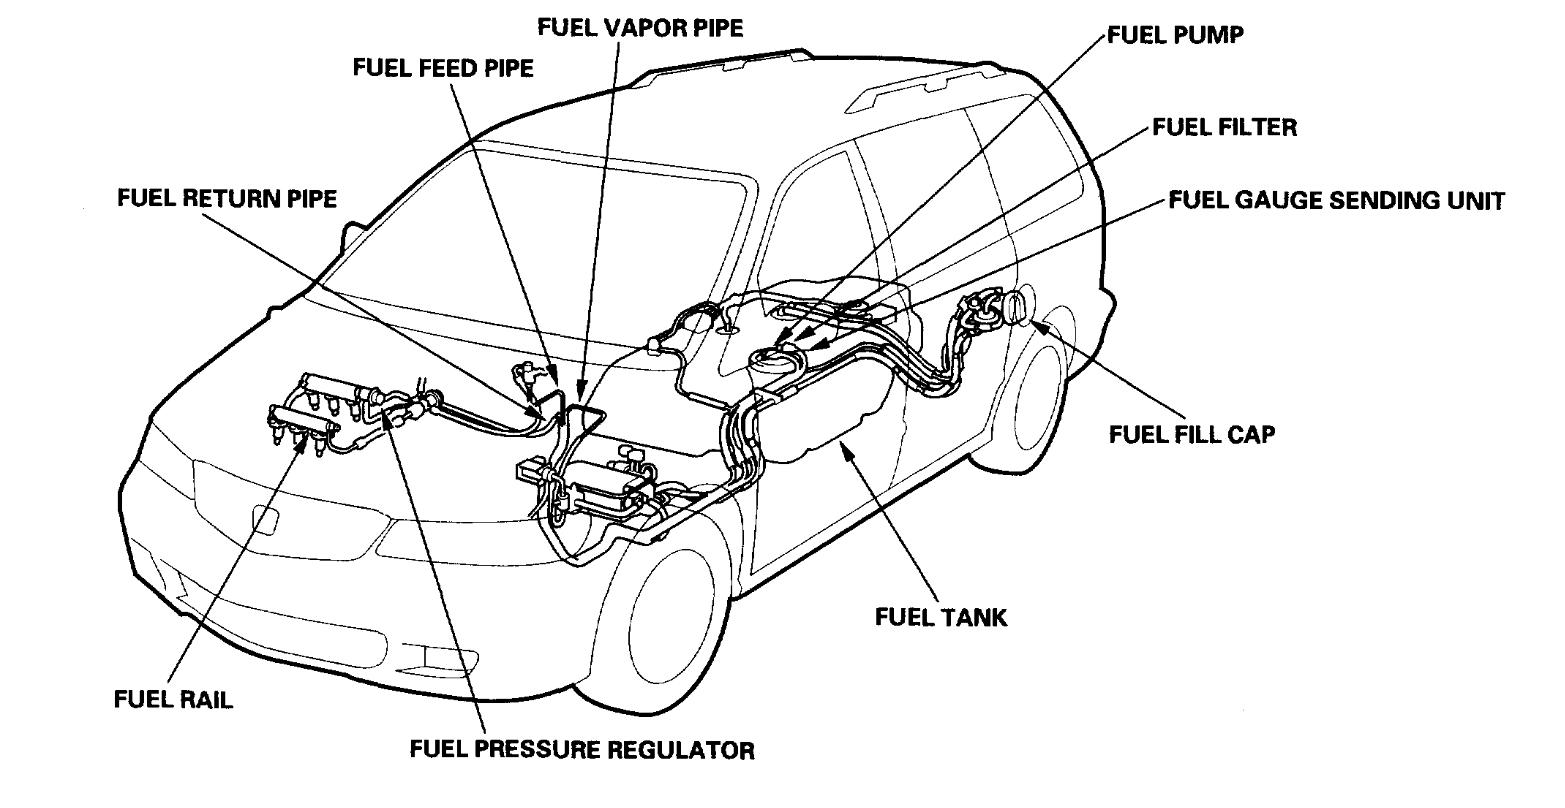 2002 Honda Accord Fuel Filter 2009 Honda Pilot Wiring Diagram For Wiring Diagram Schematics